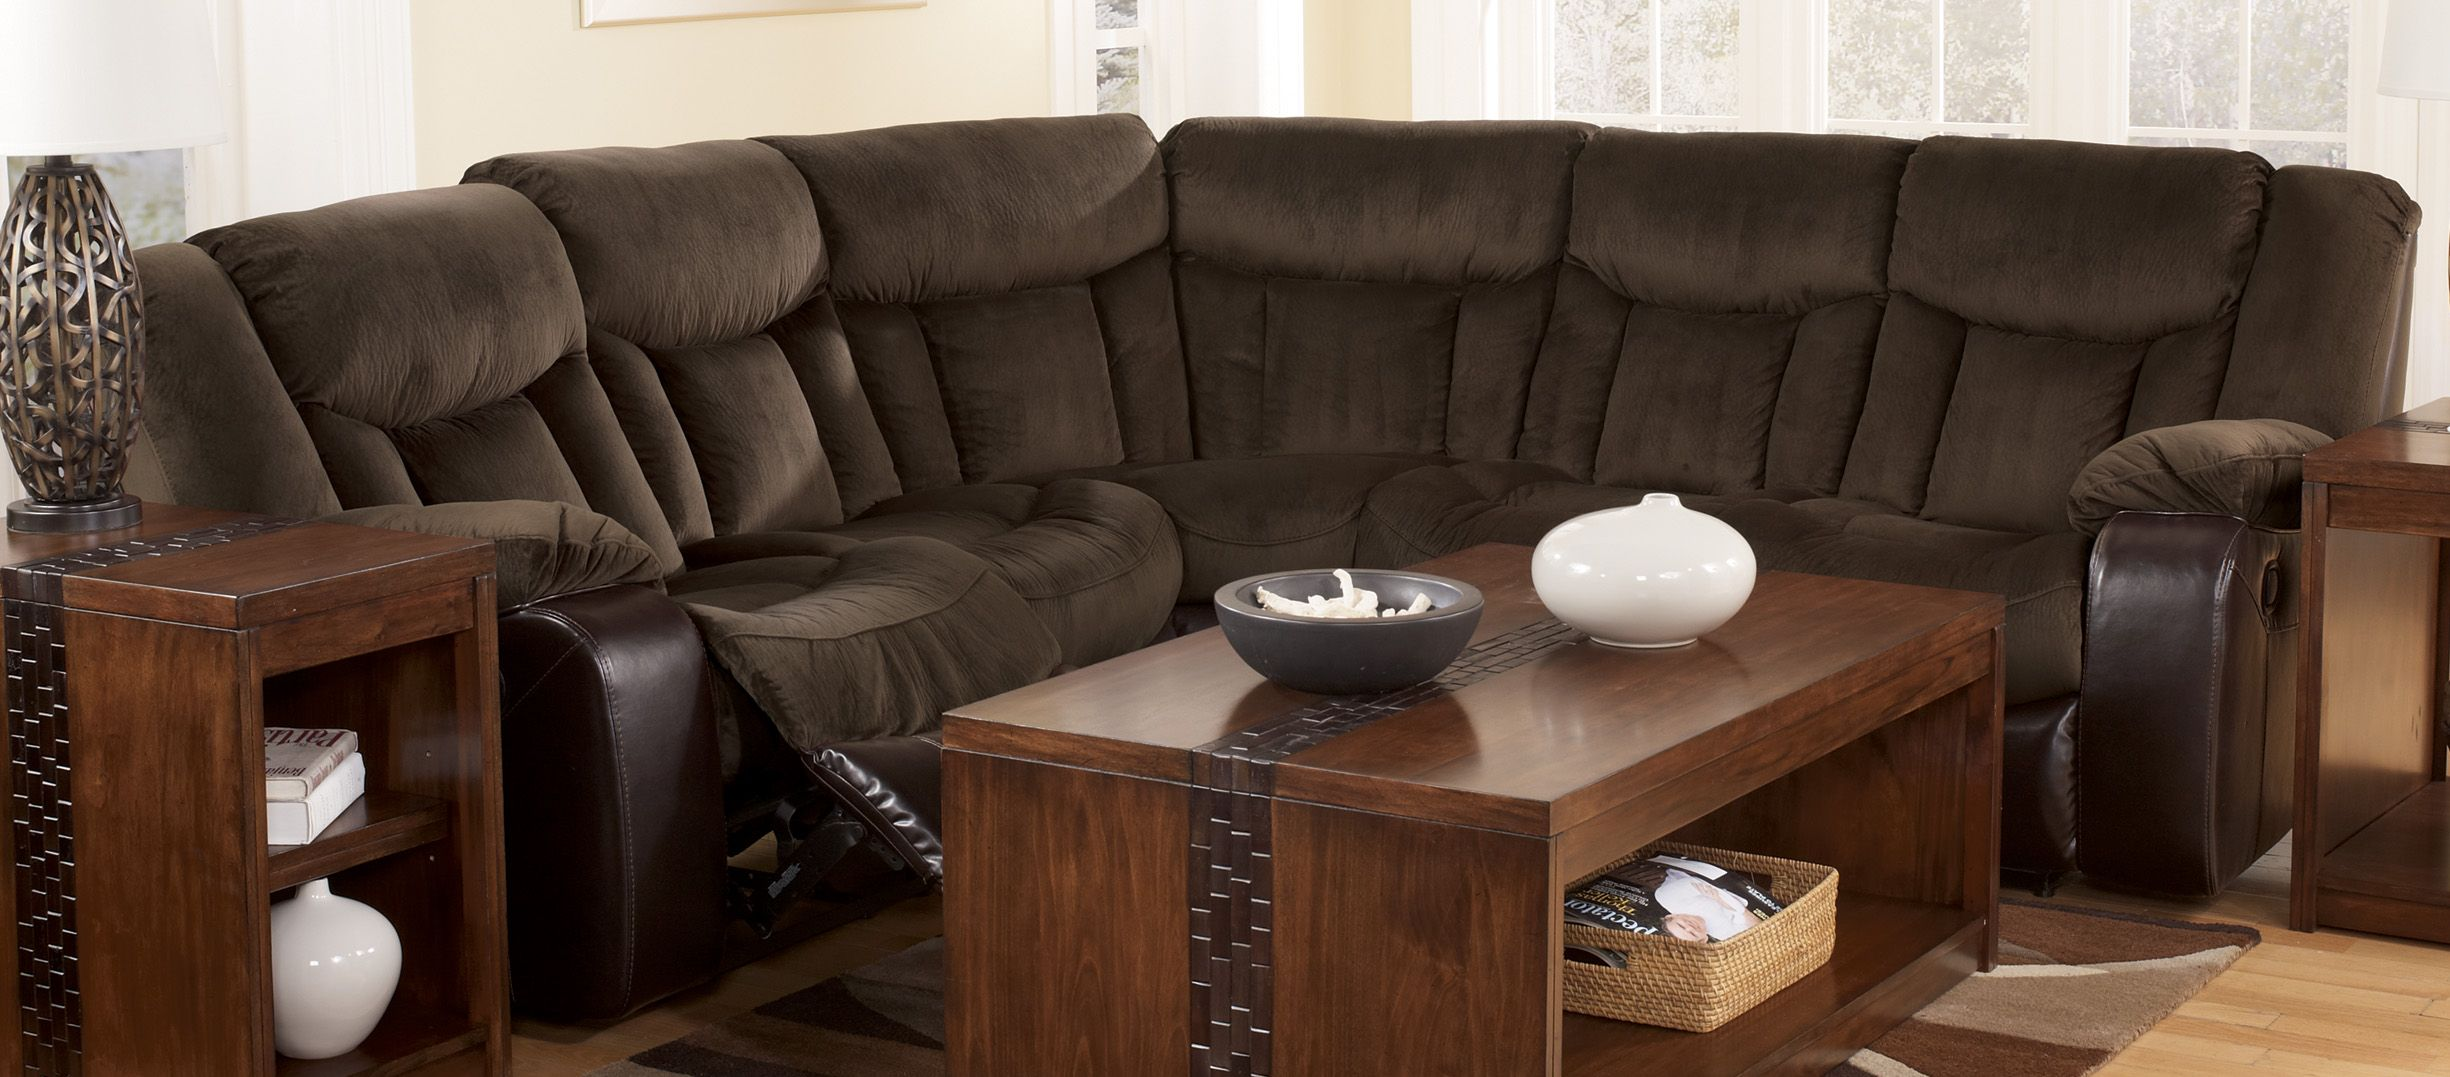 Sectional Sofa Reclining Motion Tafton Java Signature Design By Ashley Furniture Cincinnati Ohio Reclining Sofa Living Room Living Room Sofa Furniture